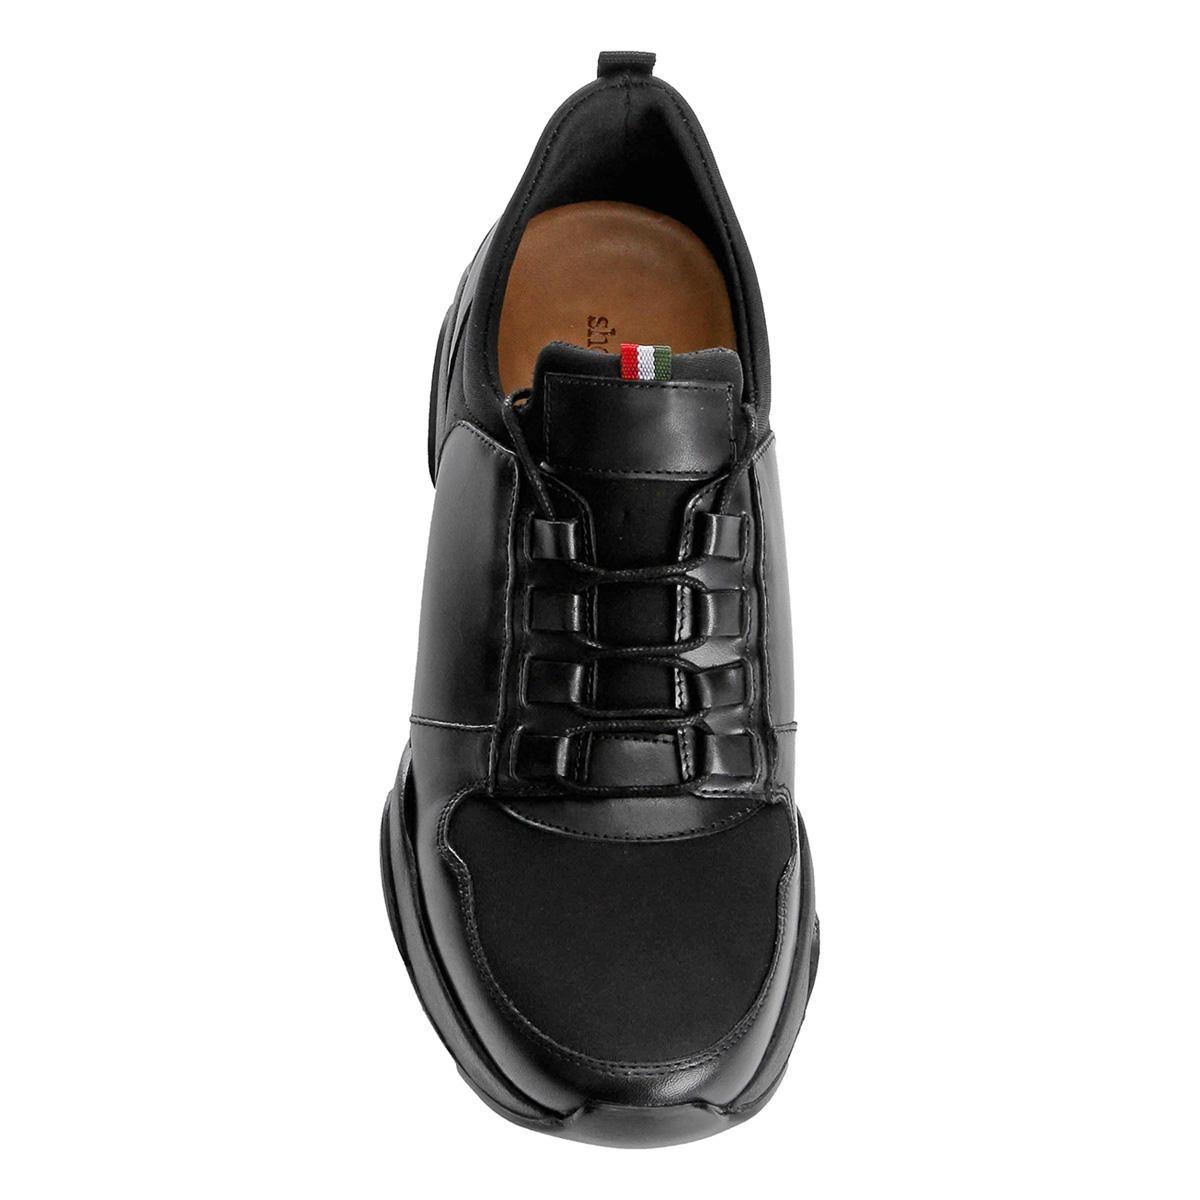 0bc233f6f7 Tênis Couro Shoestock Jogging Neoprene Masculino - R$ 199,90 em ...